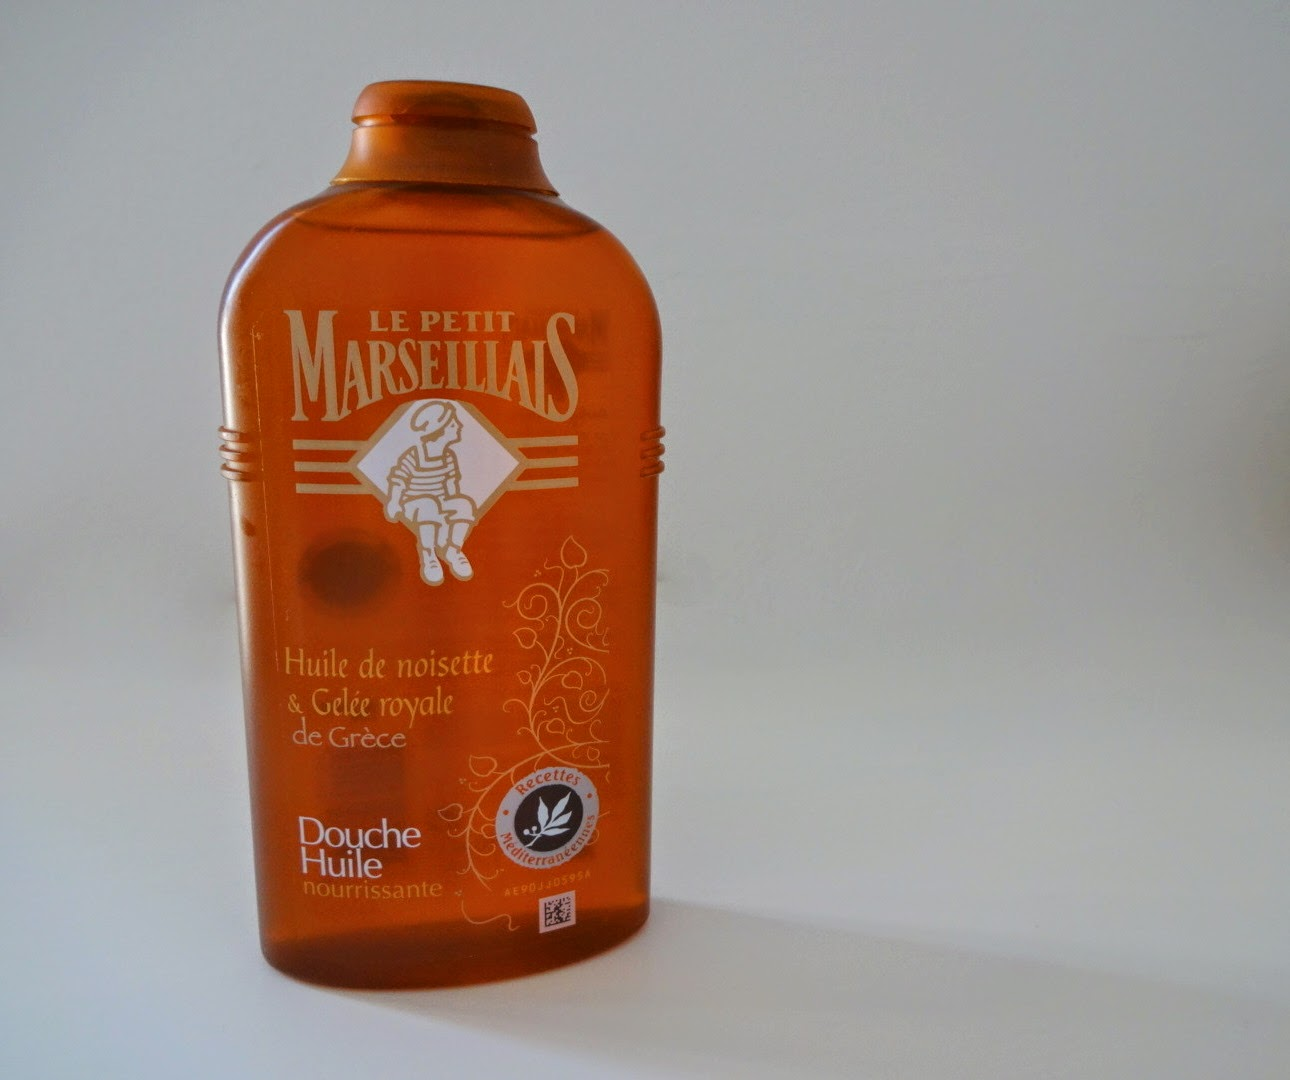 le petit marseillais, douche huile, olio doccia